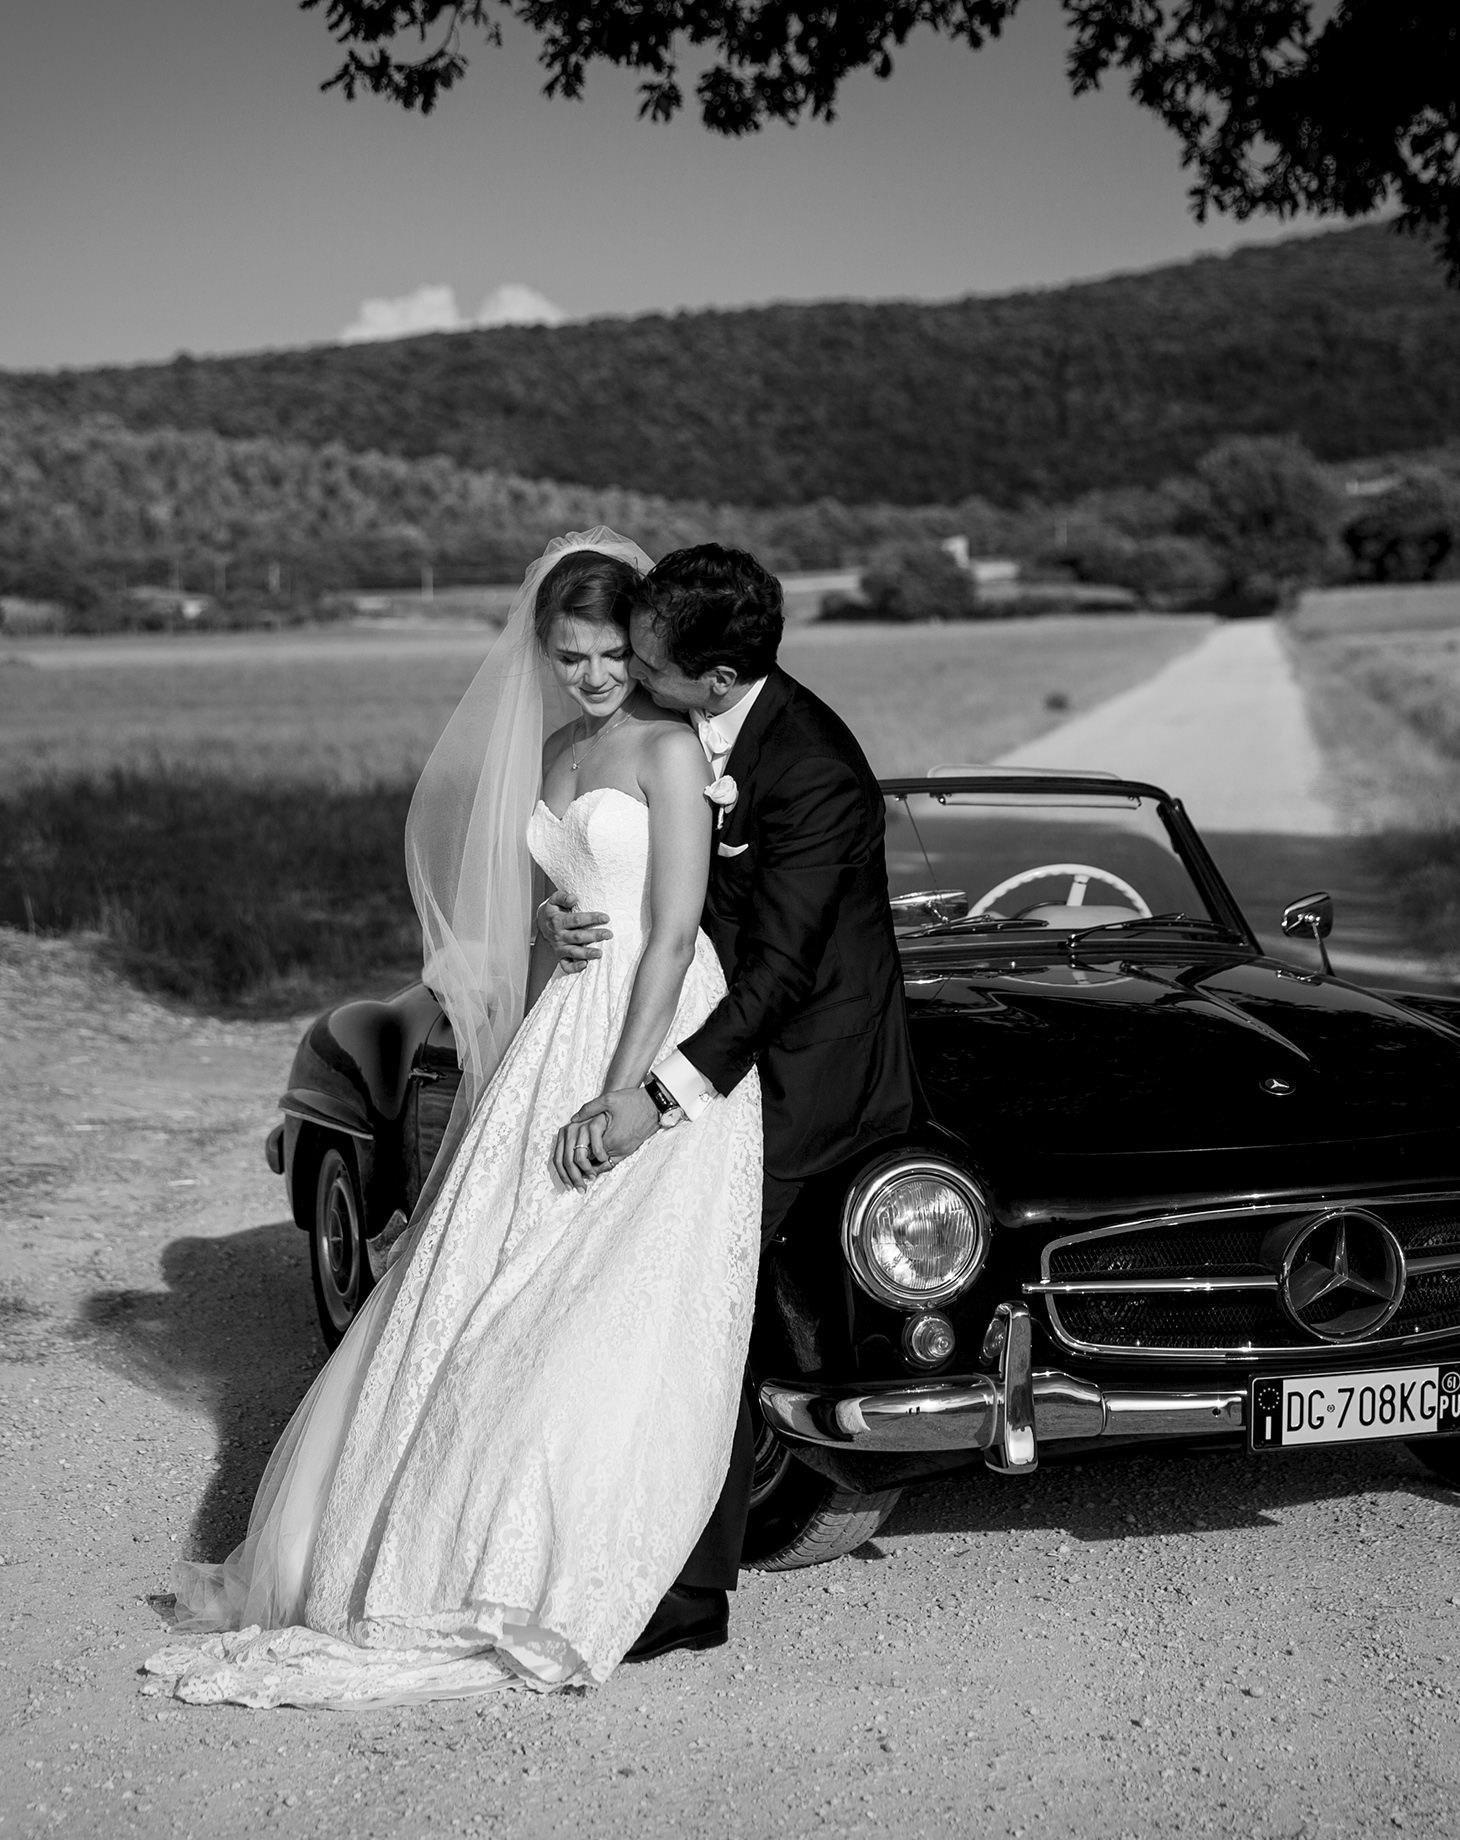 Elizaveta & Greg | Siena